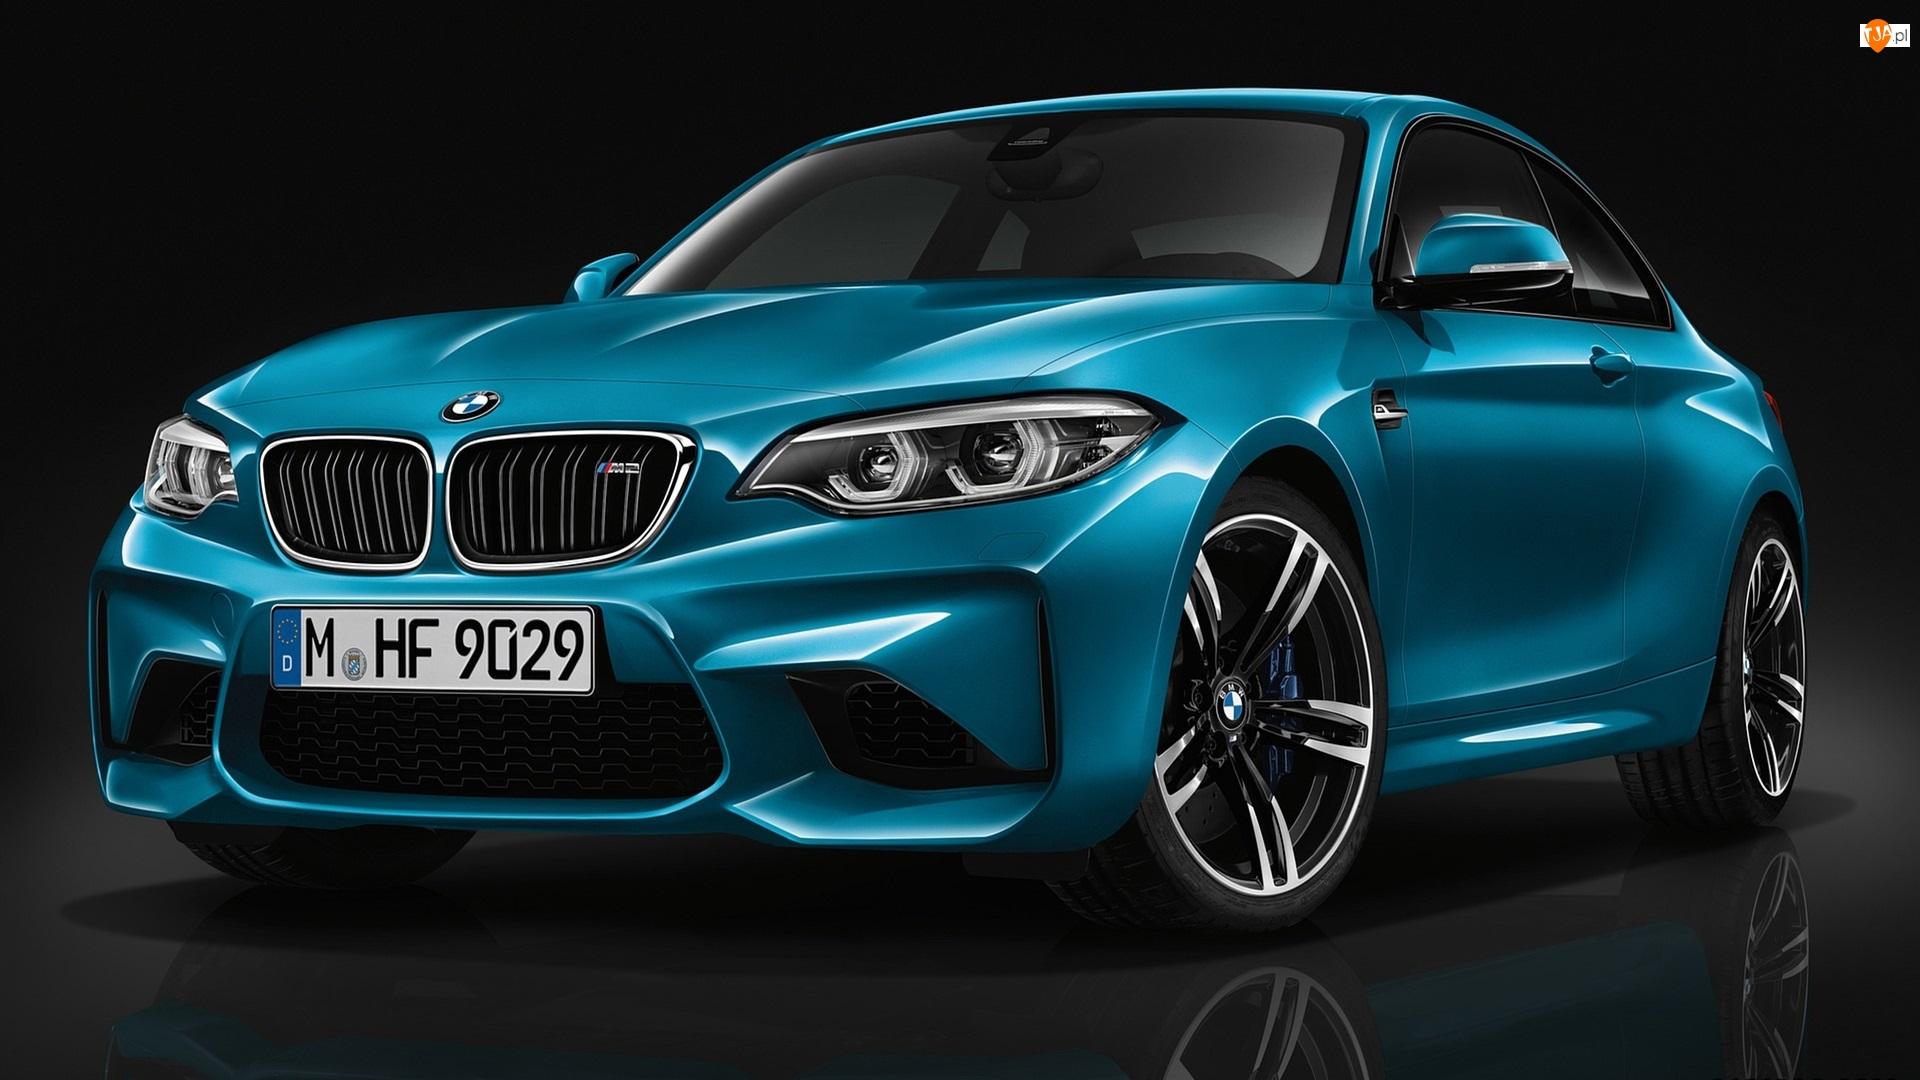 2016, Niebieskie, BMW M2 Coupe Long Beach Blue Metallic